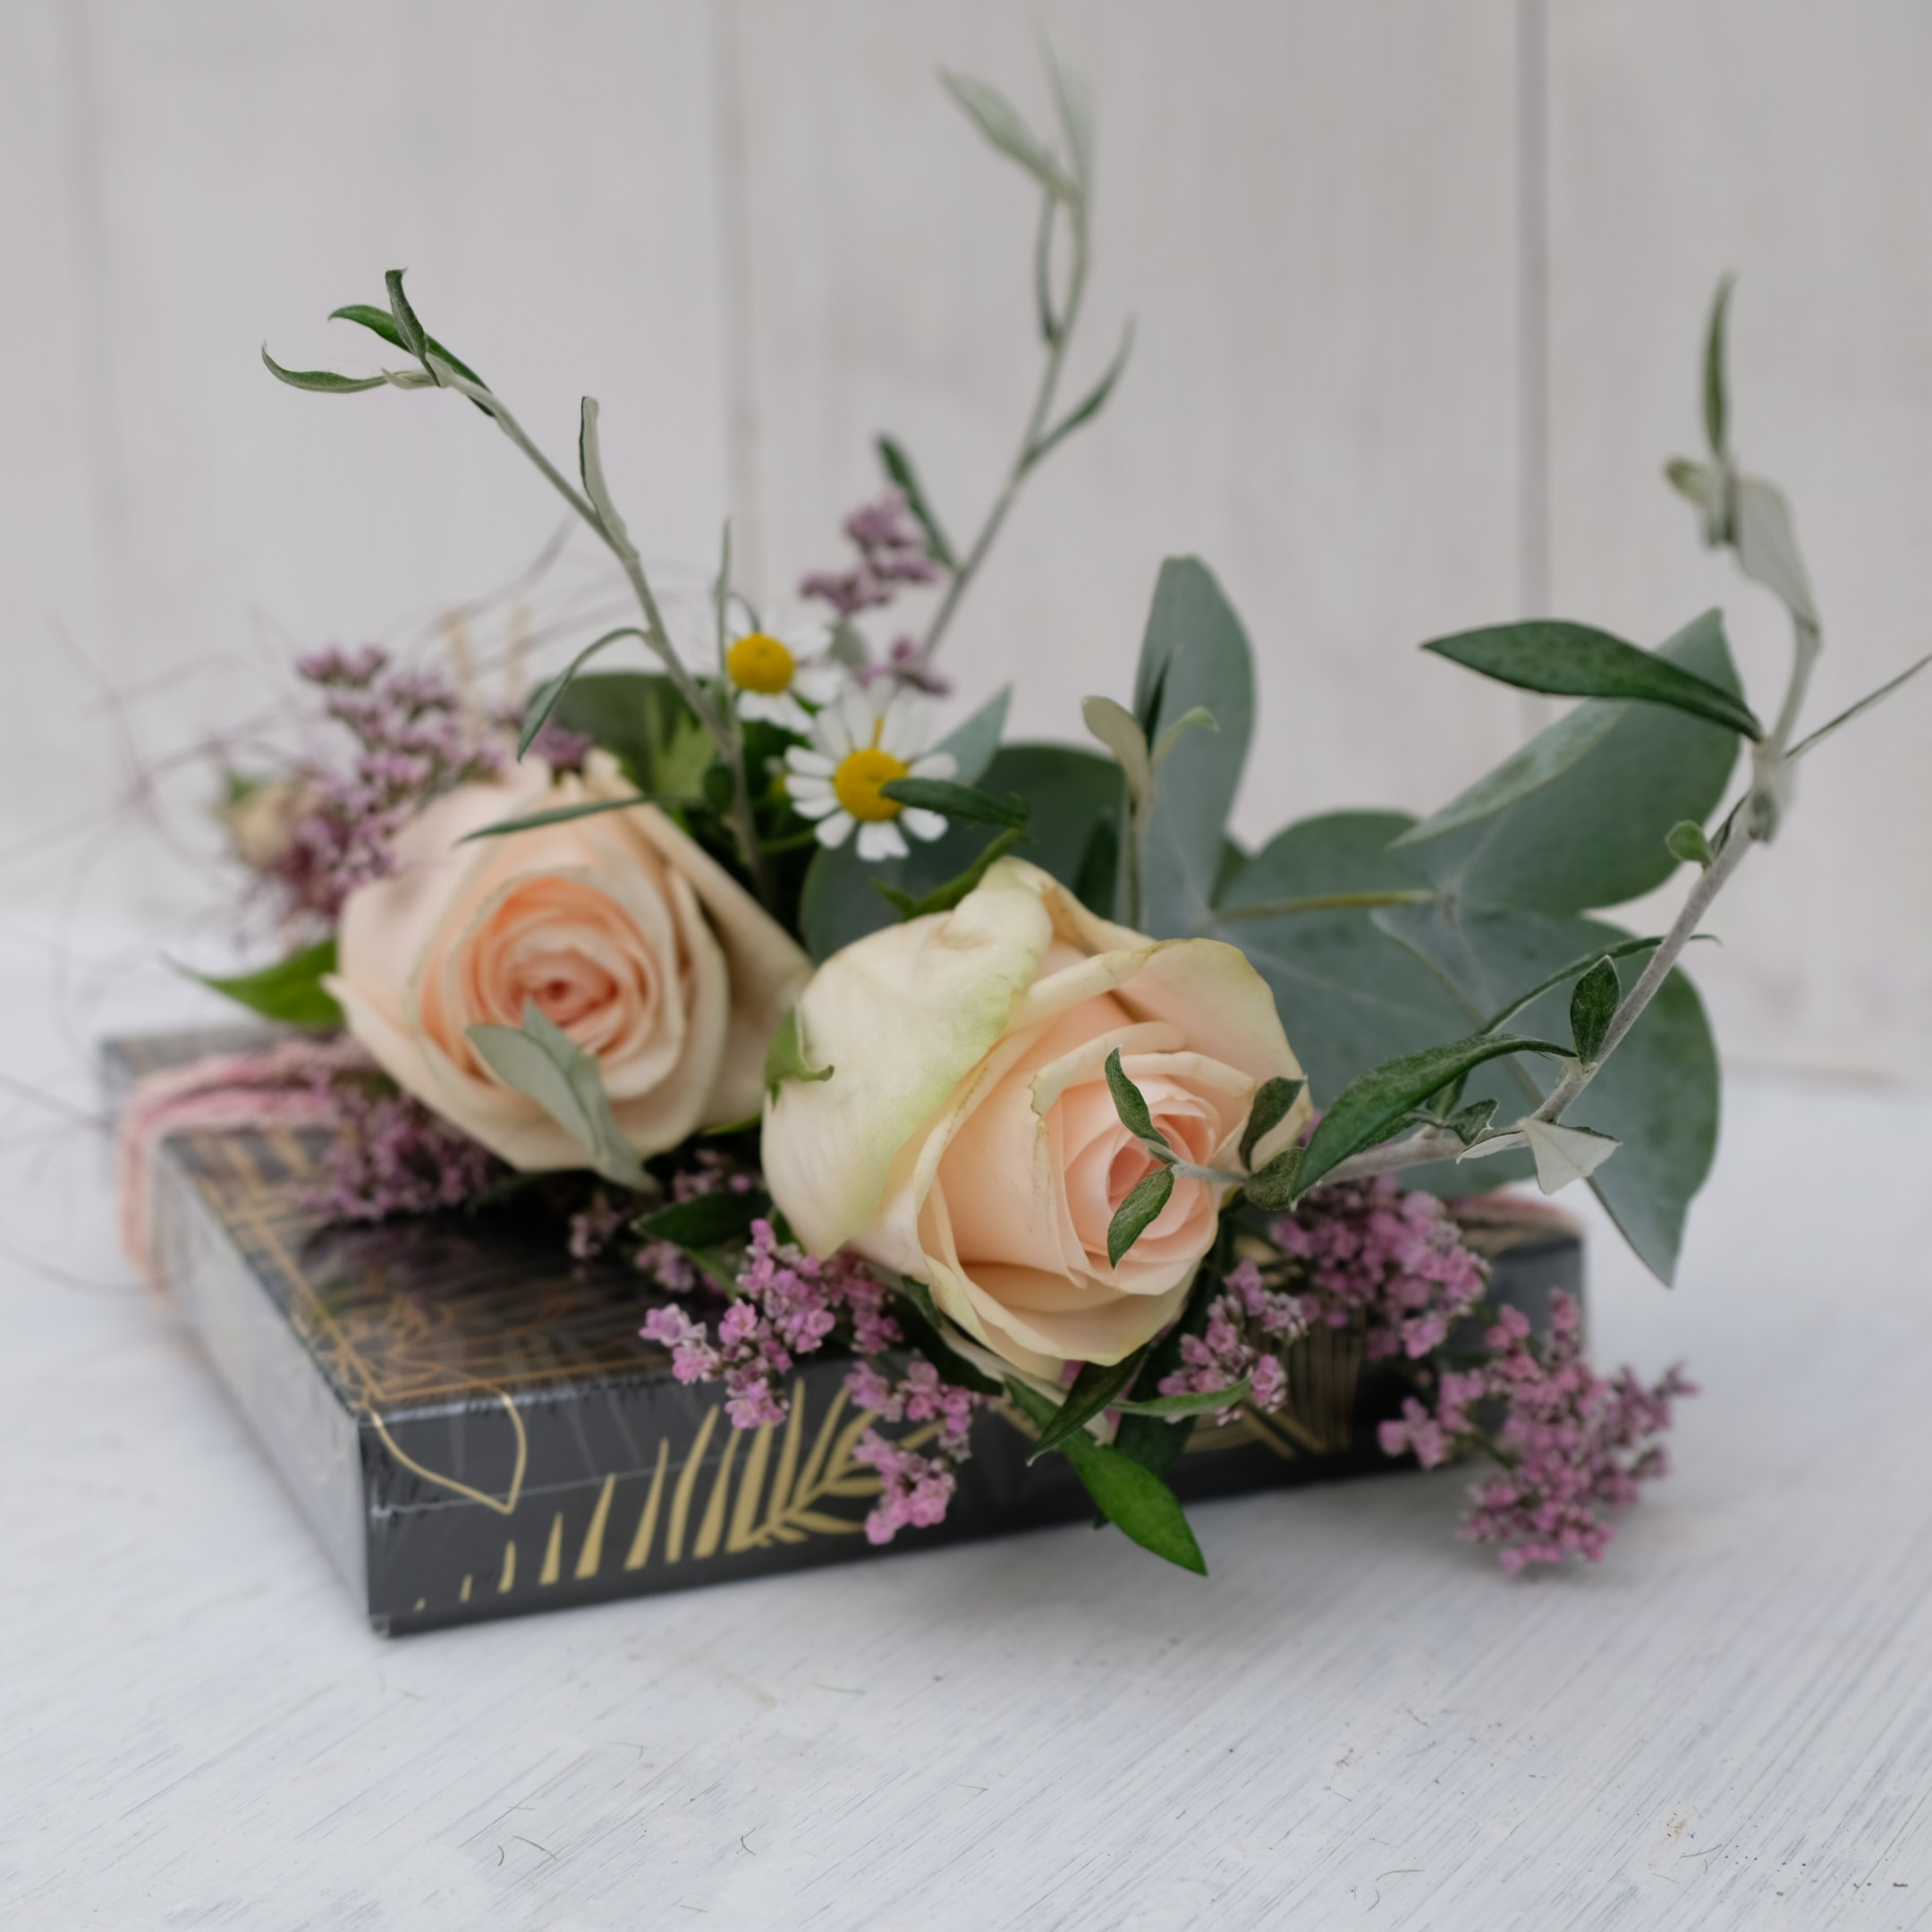 süßer Blumengruß Bild 1